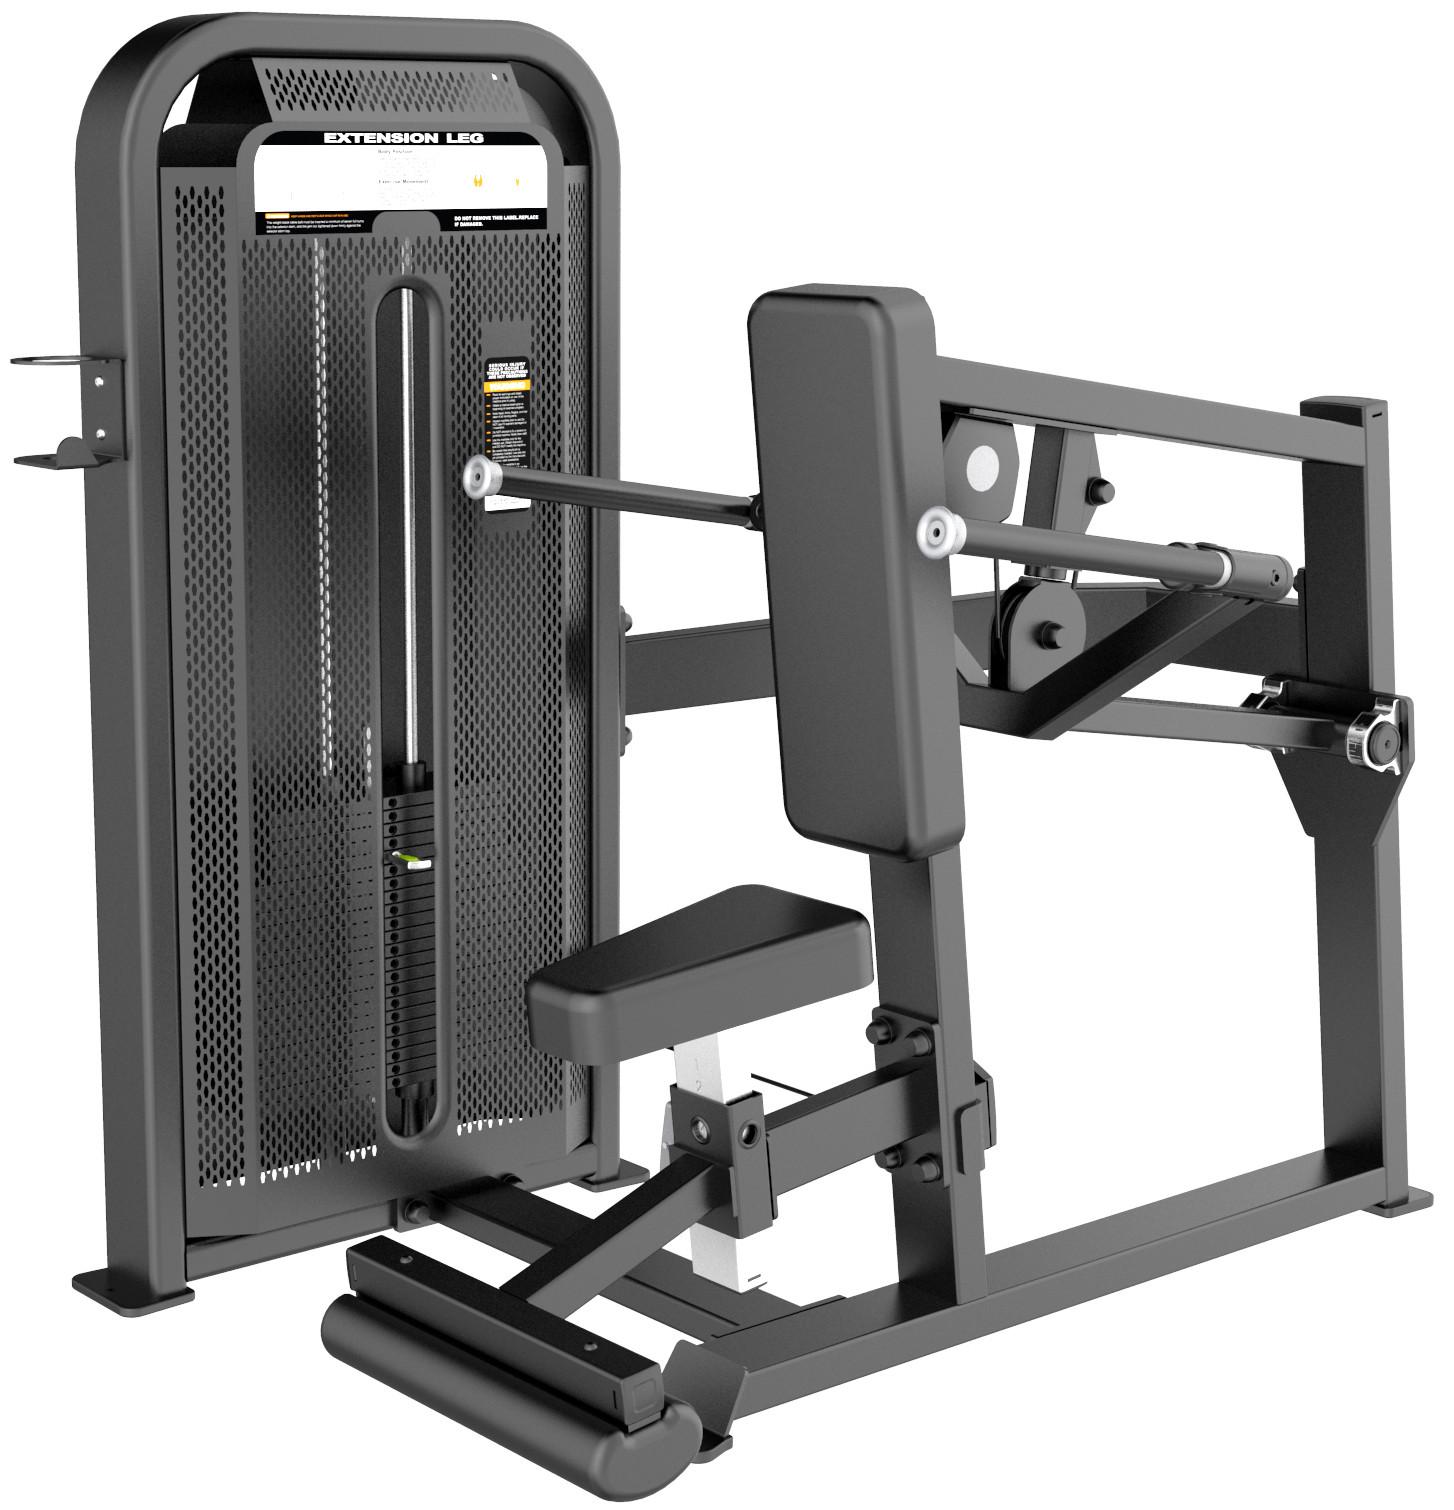 E-5026 Трицепс-машина. Имитация отжиманий (Seated Dip). Стек 109 кг.